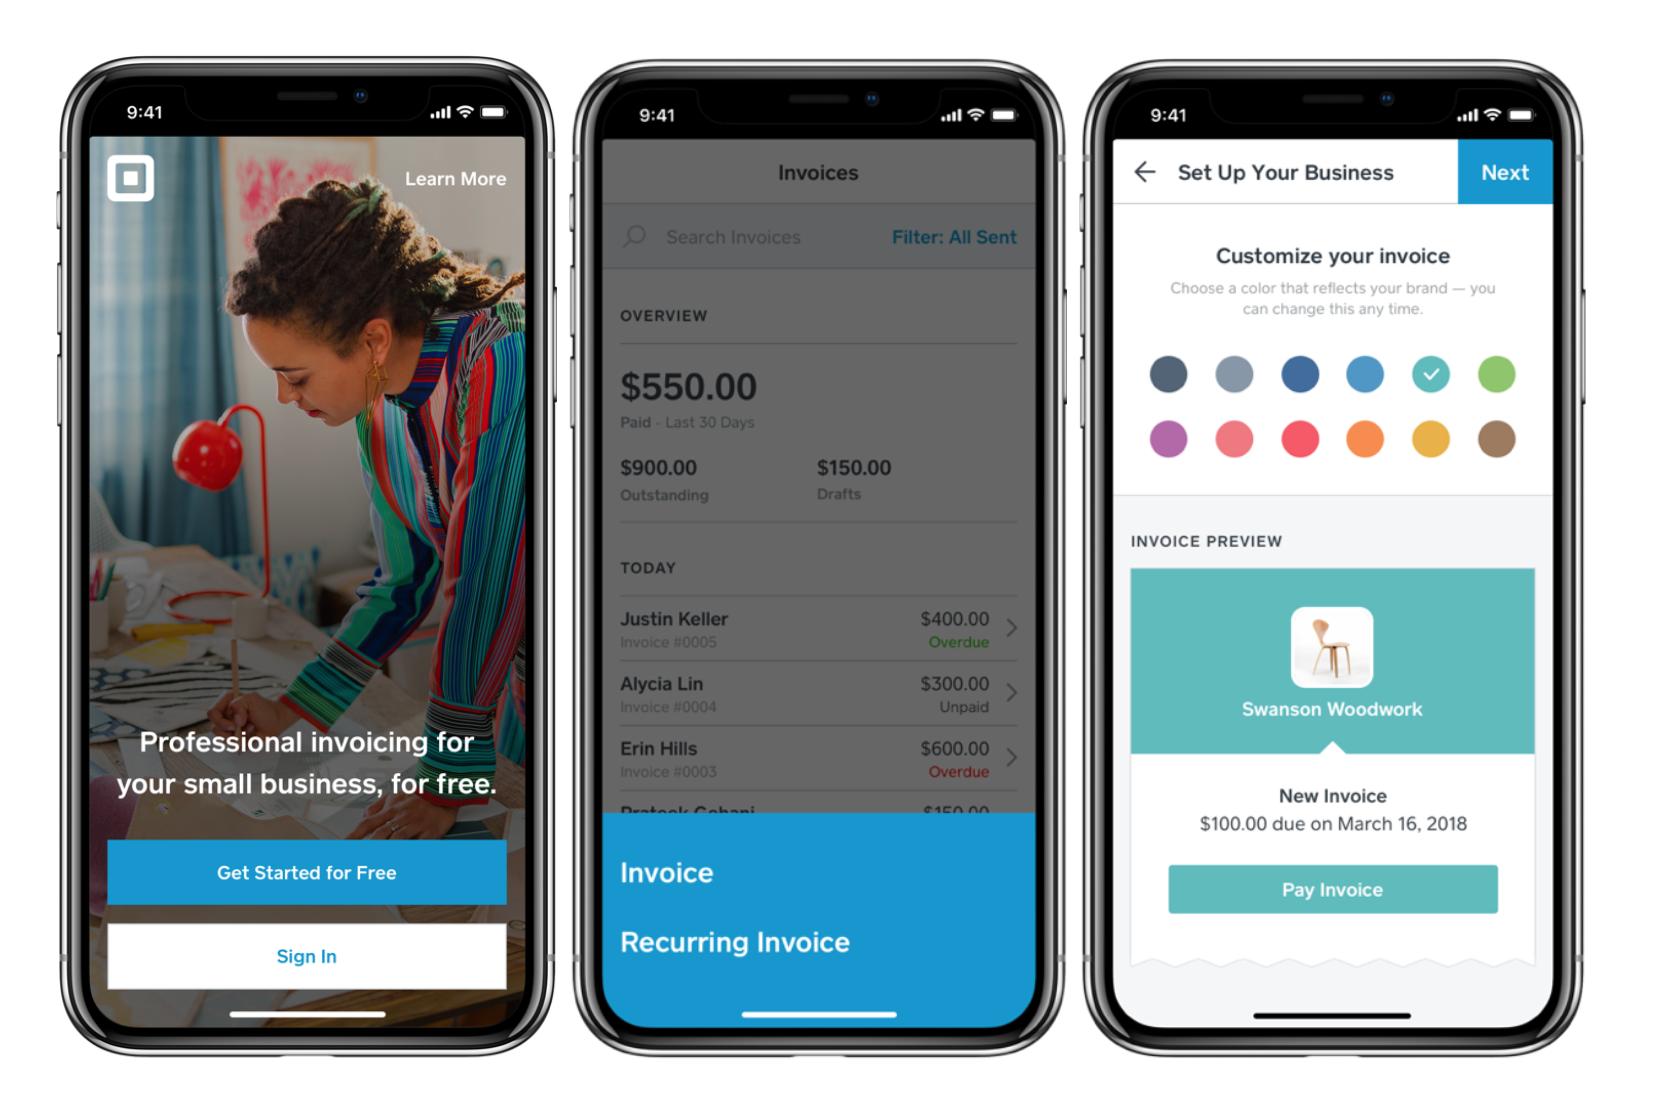 square invoices app screenshot